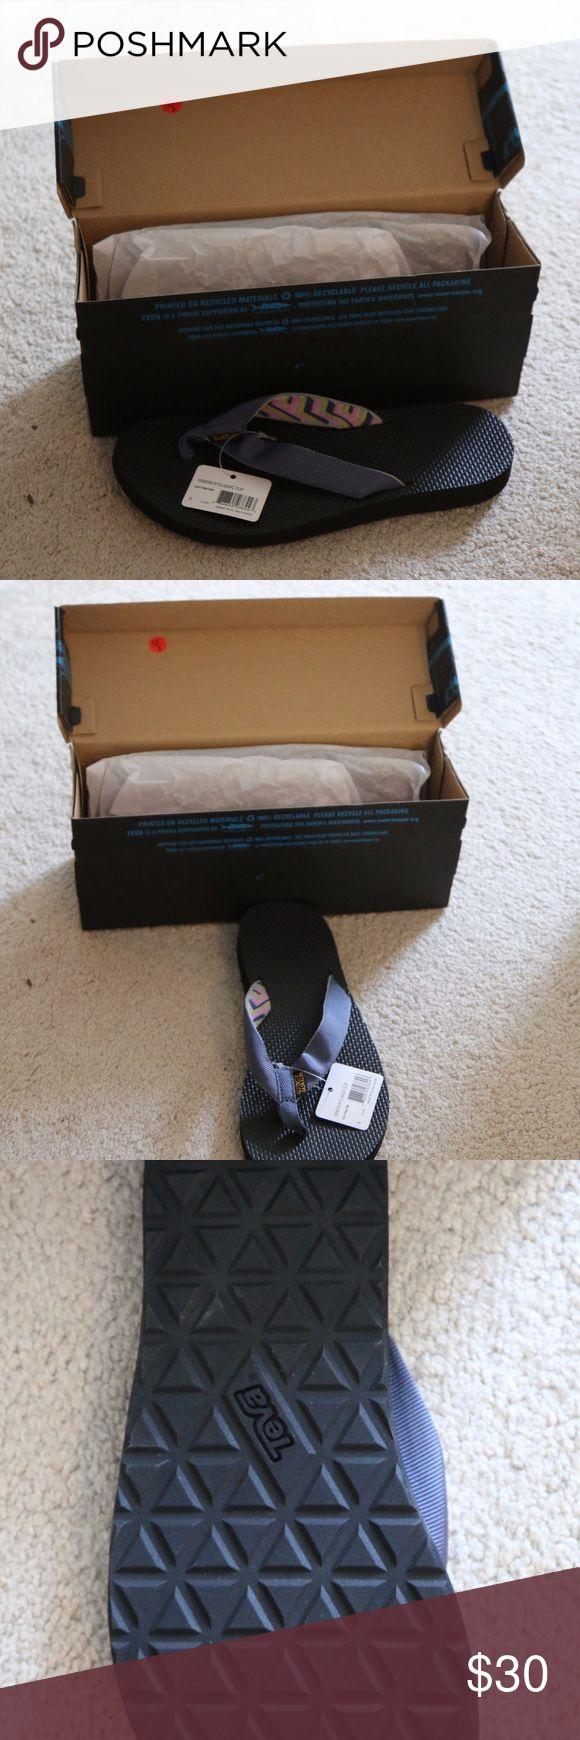 "Brand New Teva Flip-Flops with box Very comfortable BNWT and box Teva sandals in ""Azura Vintage Indigo"" Teva Shoes Sandals"